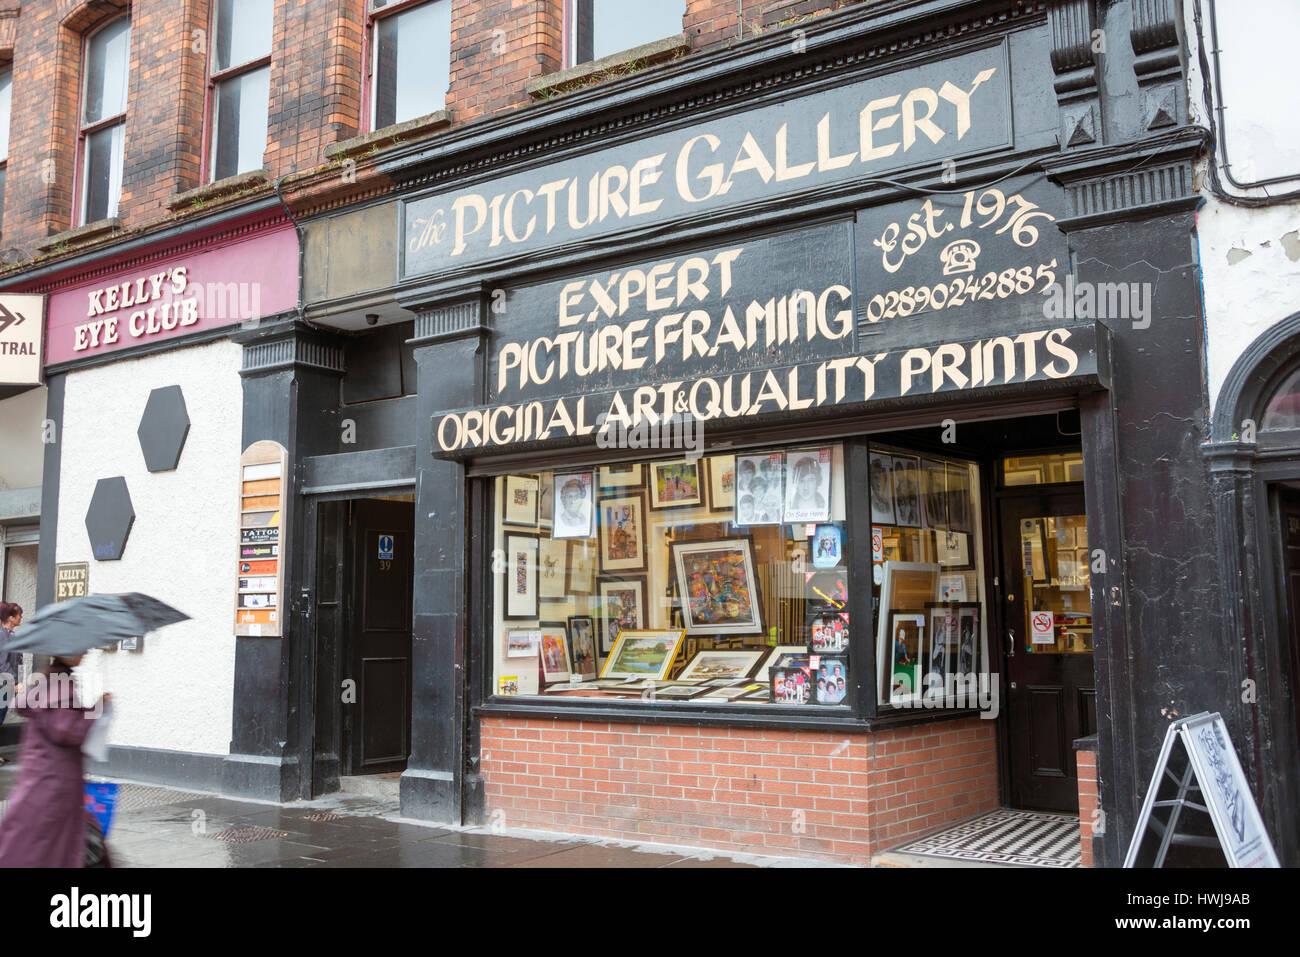 Picture gallery belfast northern ireland great britain stock picture gallery belfast northern ireland great britain jeuxipadfo Choice Image